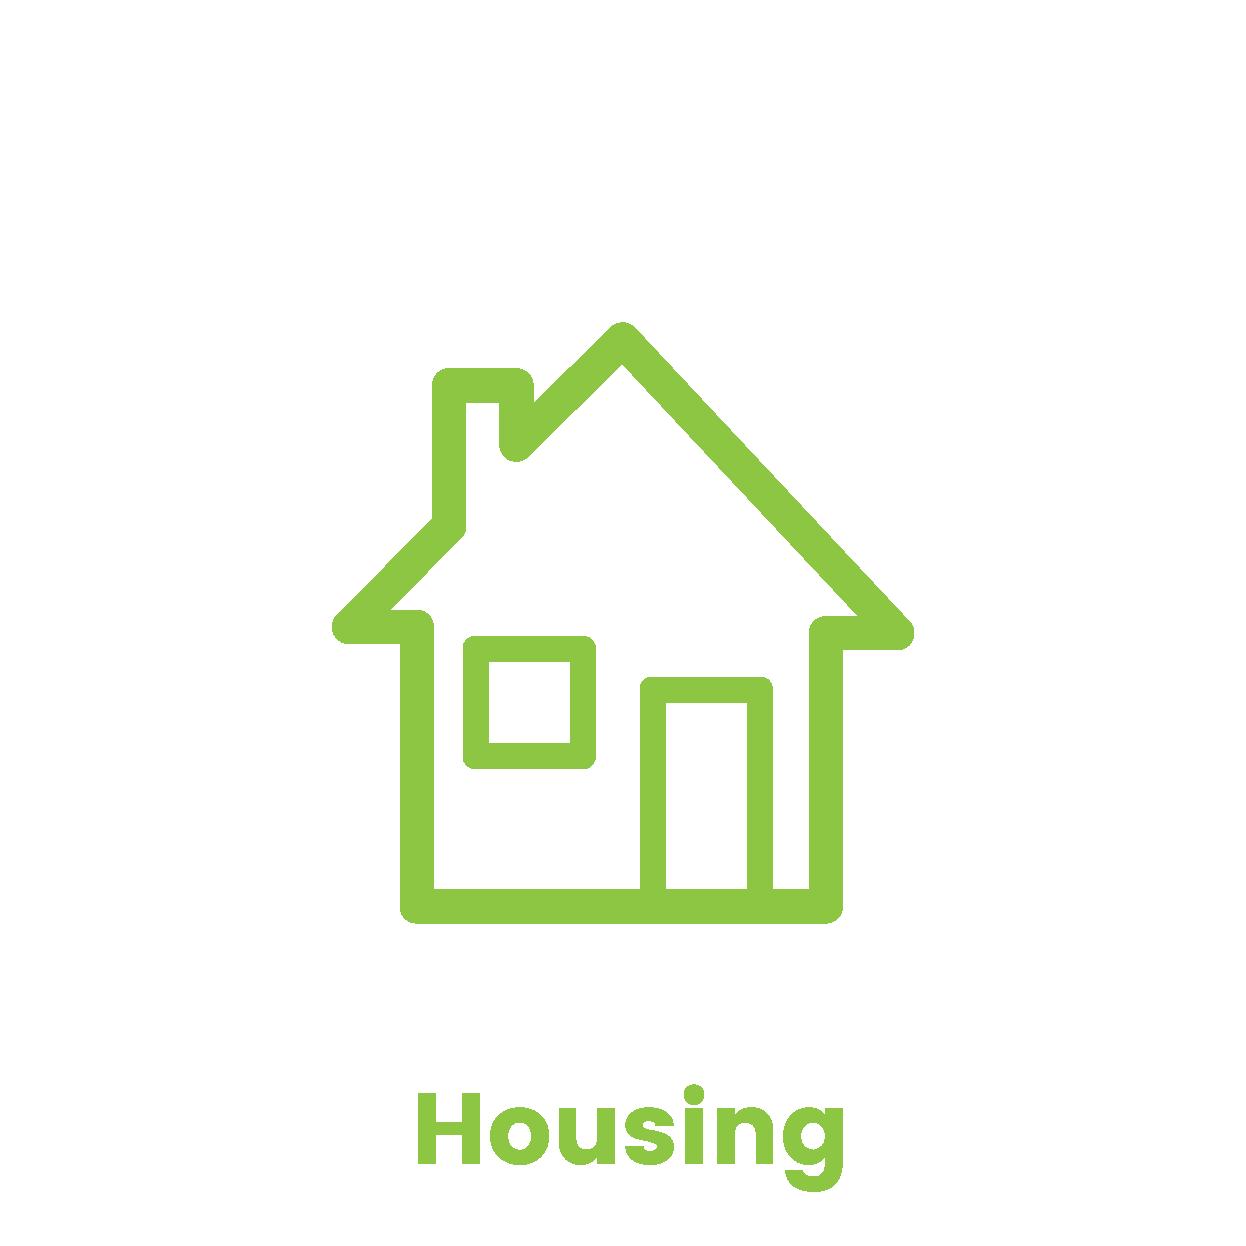 p4 PM - Housing-01.png